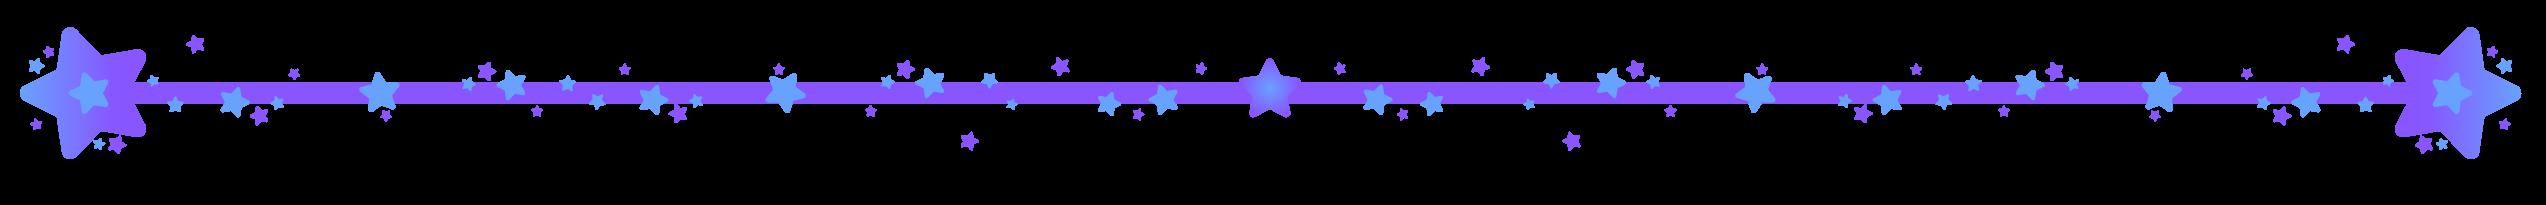 Star_divider-01.png